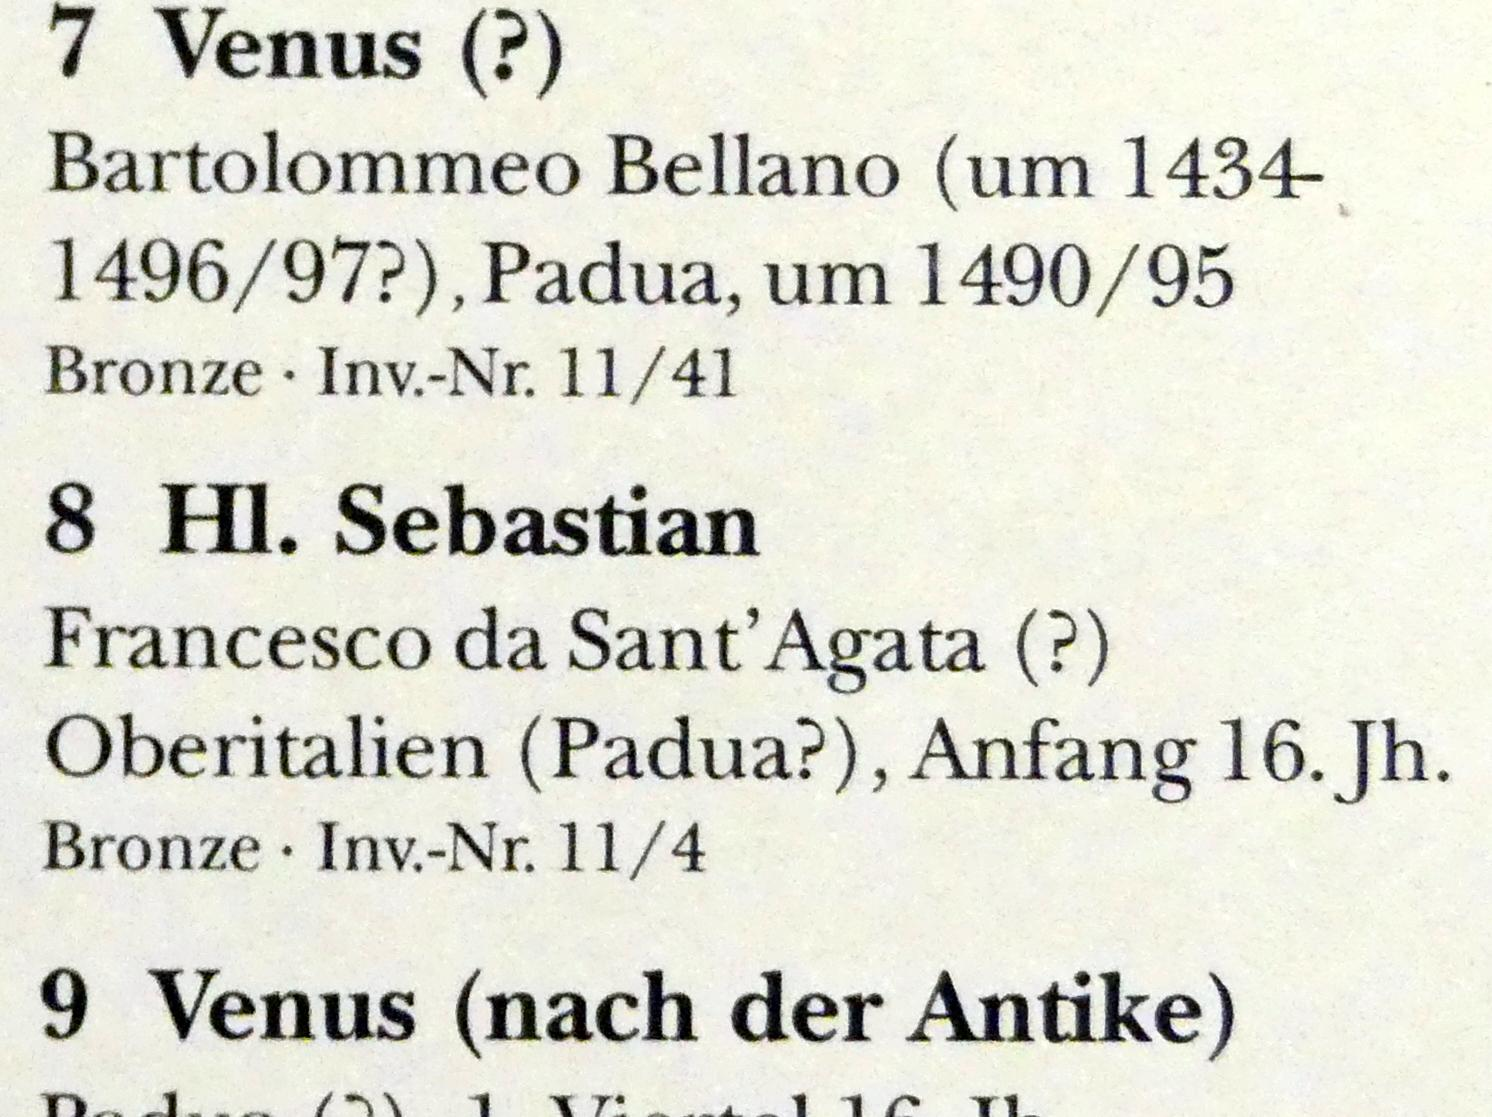 Francesco da Sant'Agata: Hl. Sebastian, Beginn 16. Jhd.